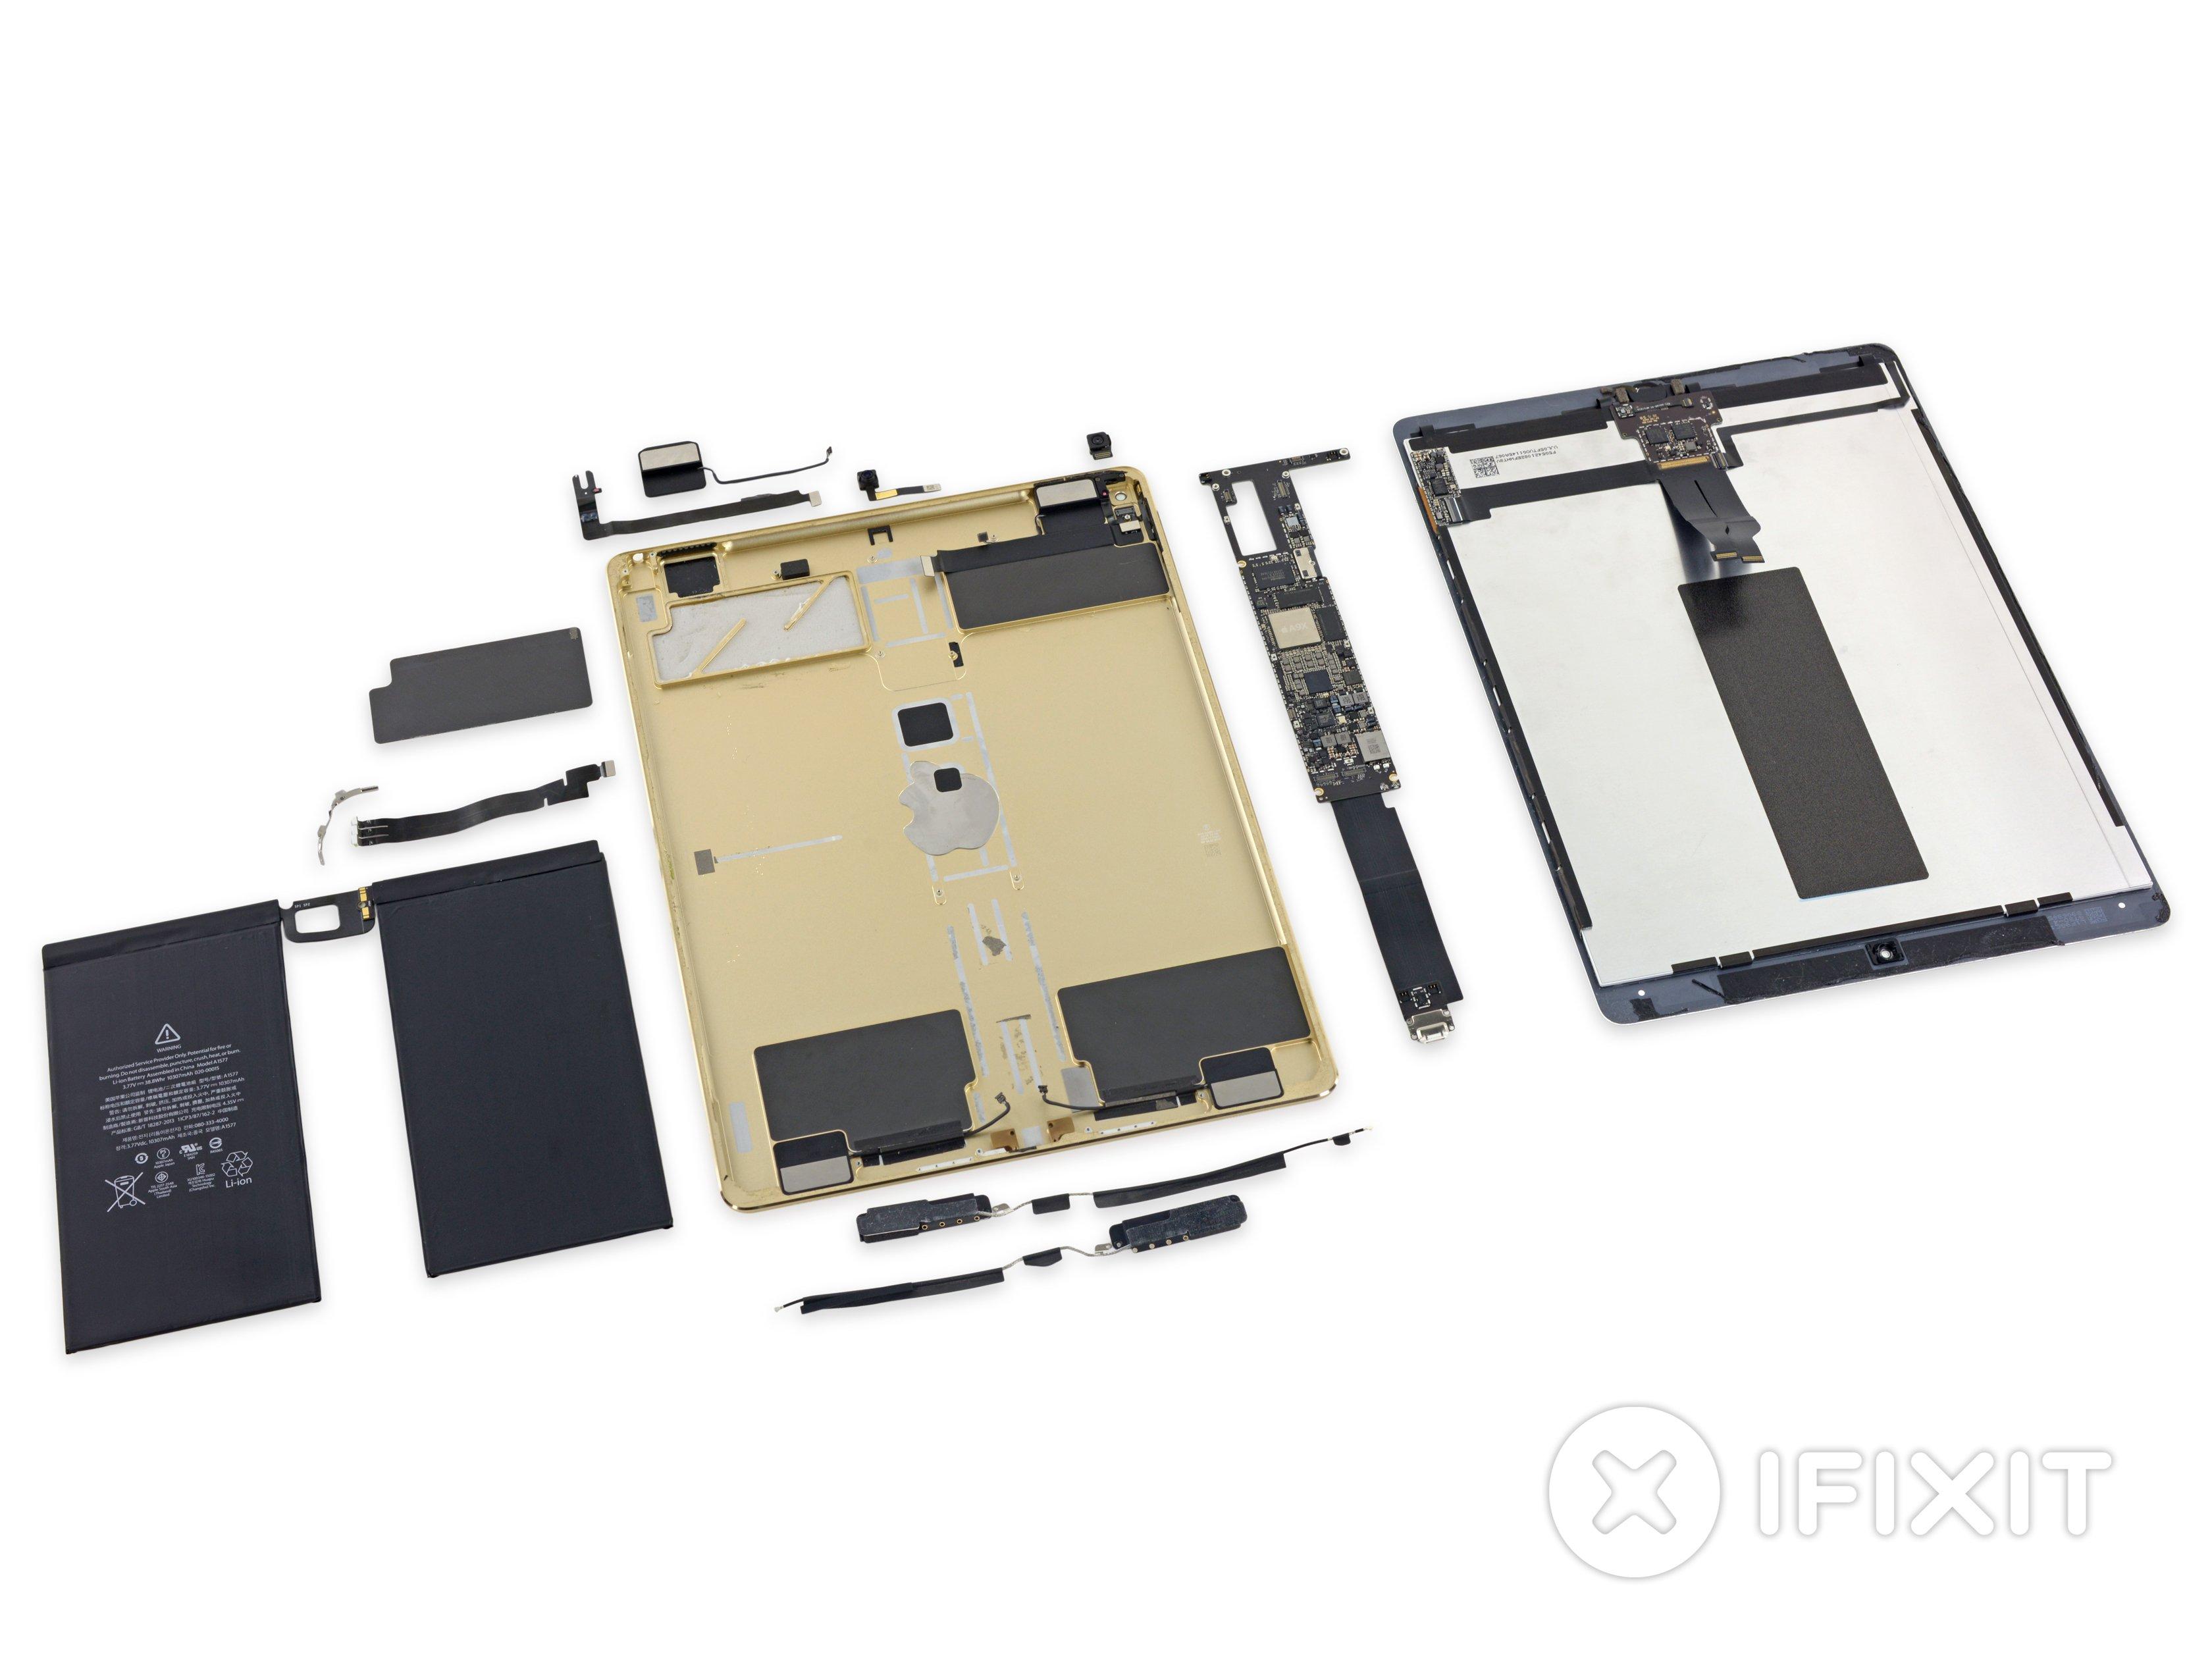 "iPad Pro 12.9"" Teardown"